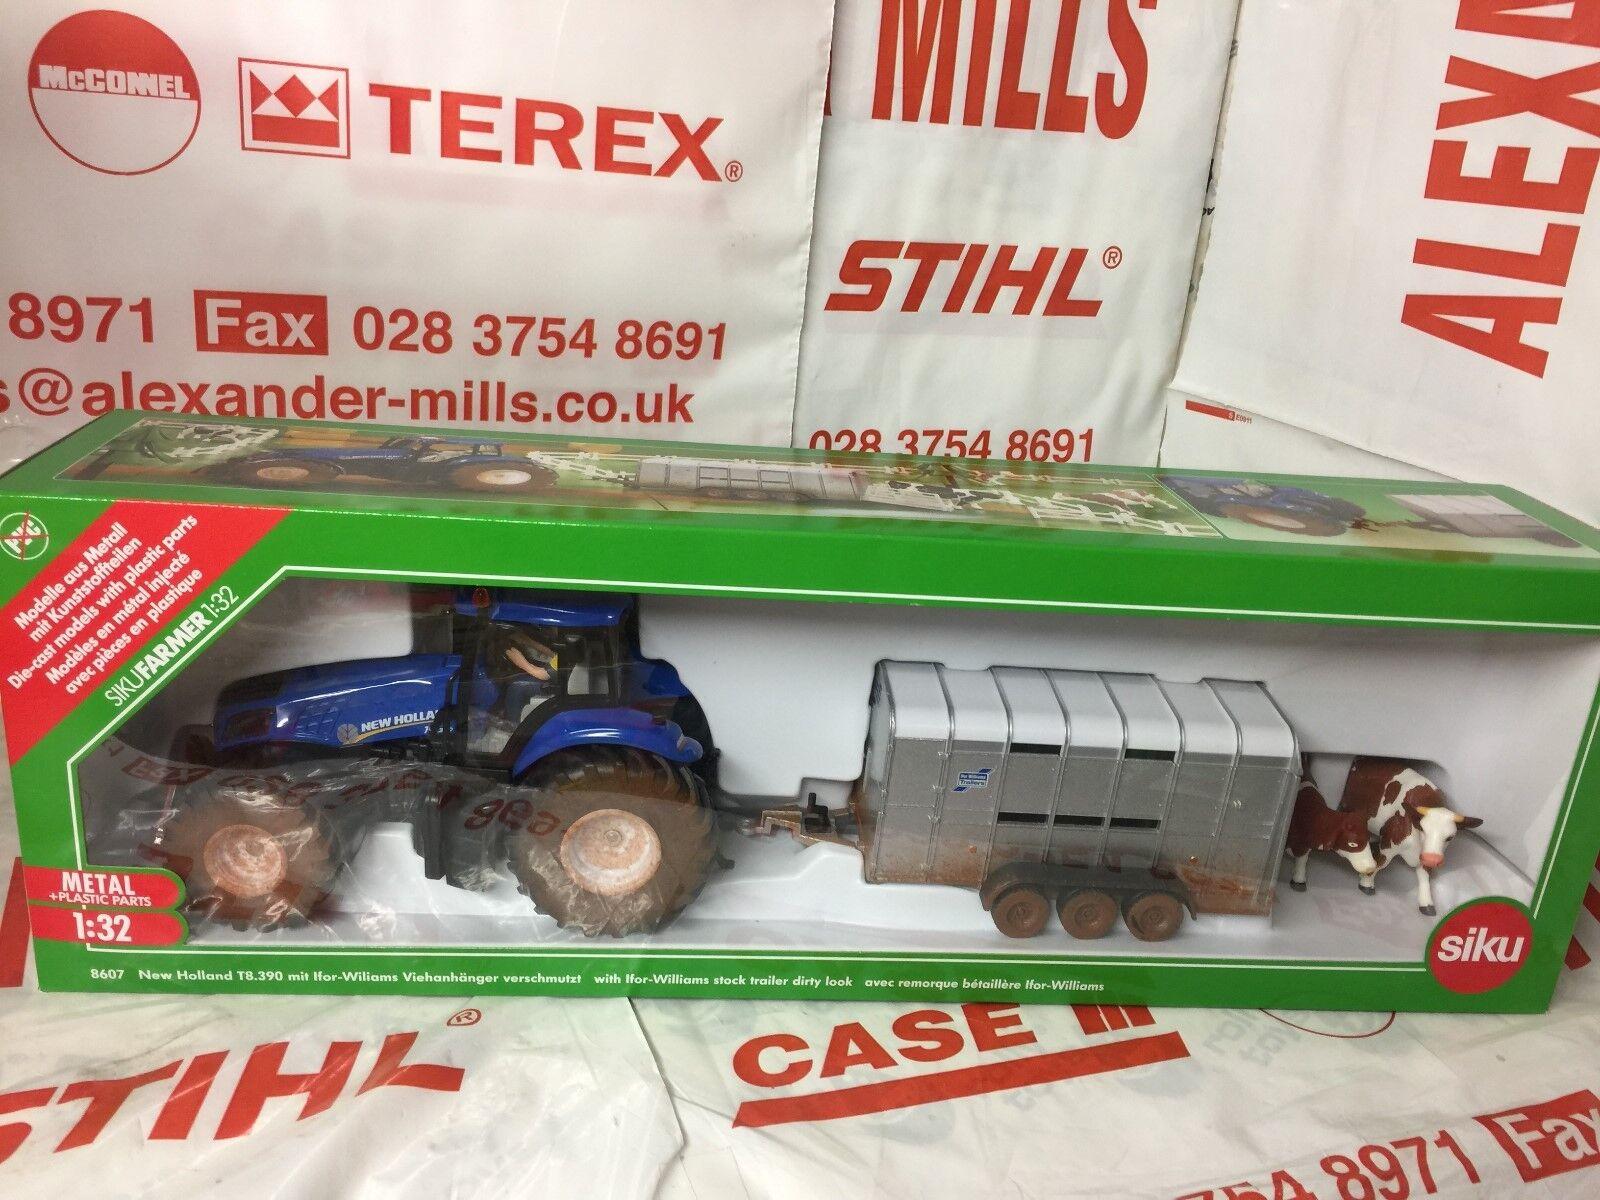 SIKU 8607 Modèle Jouet New Holland Tracteur & IFOR WILLIAMS Remorque 1 32 Replica Toy